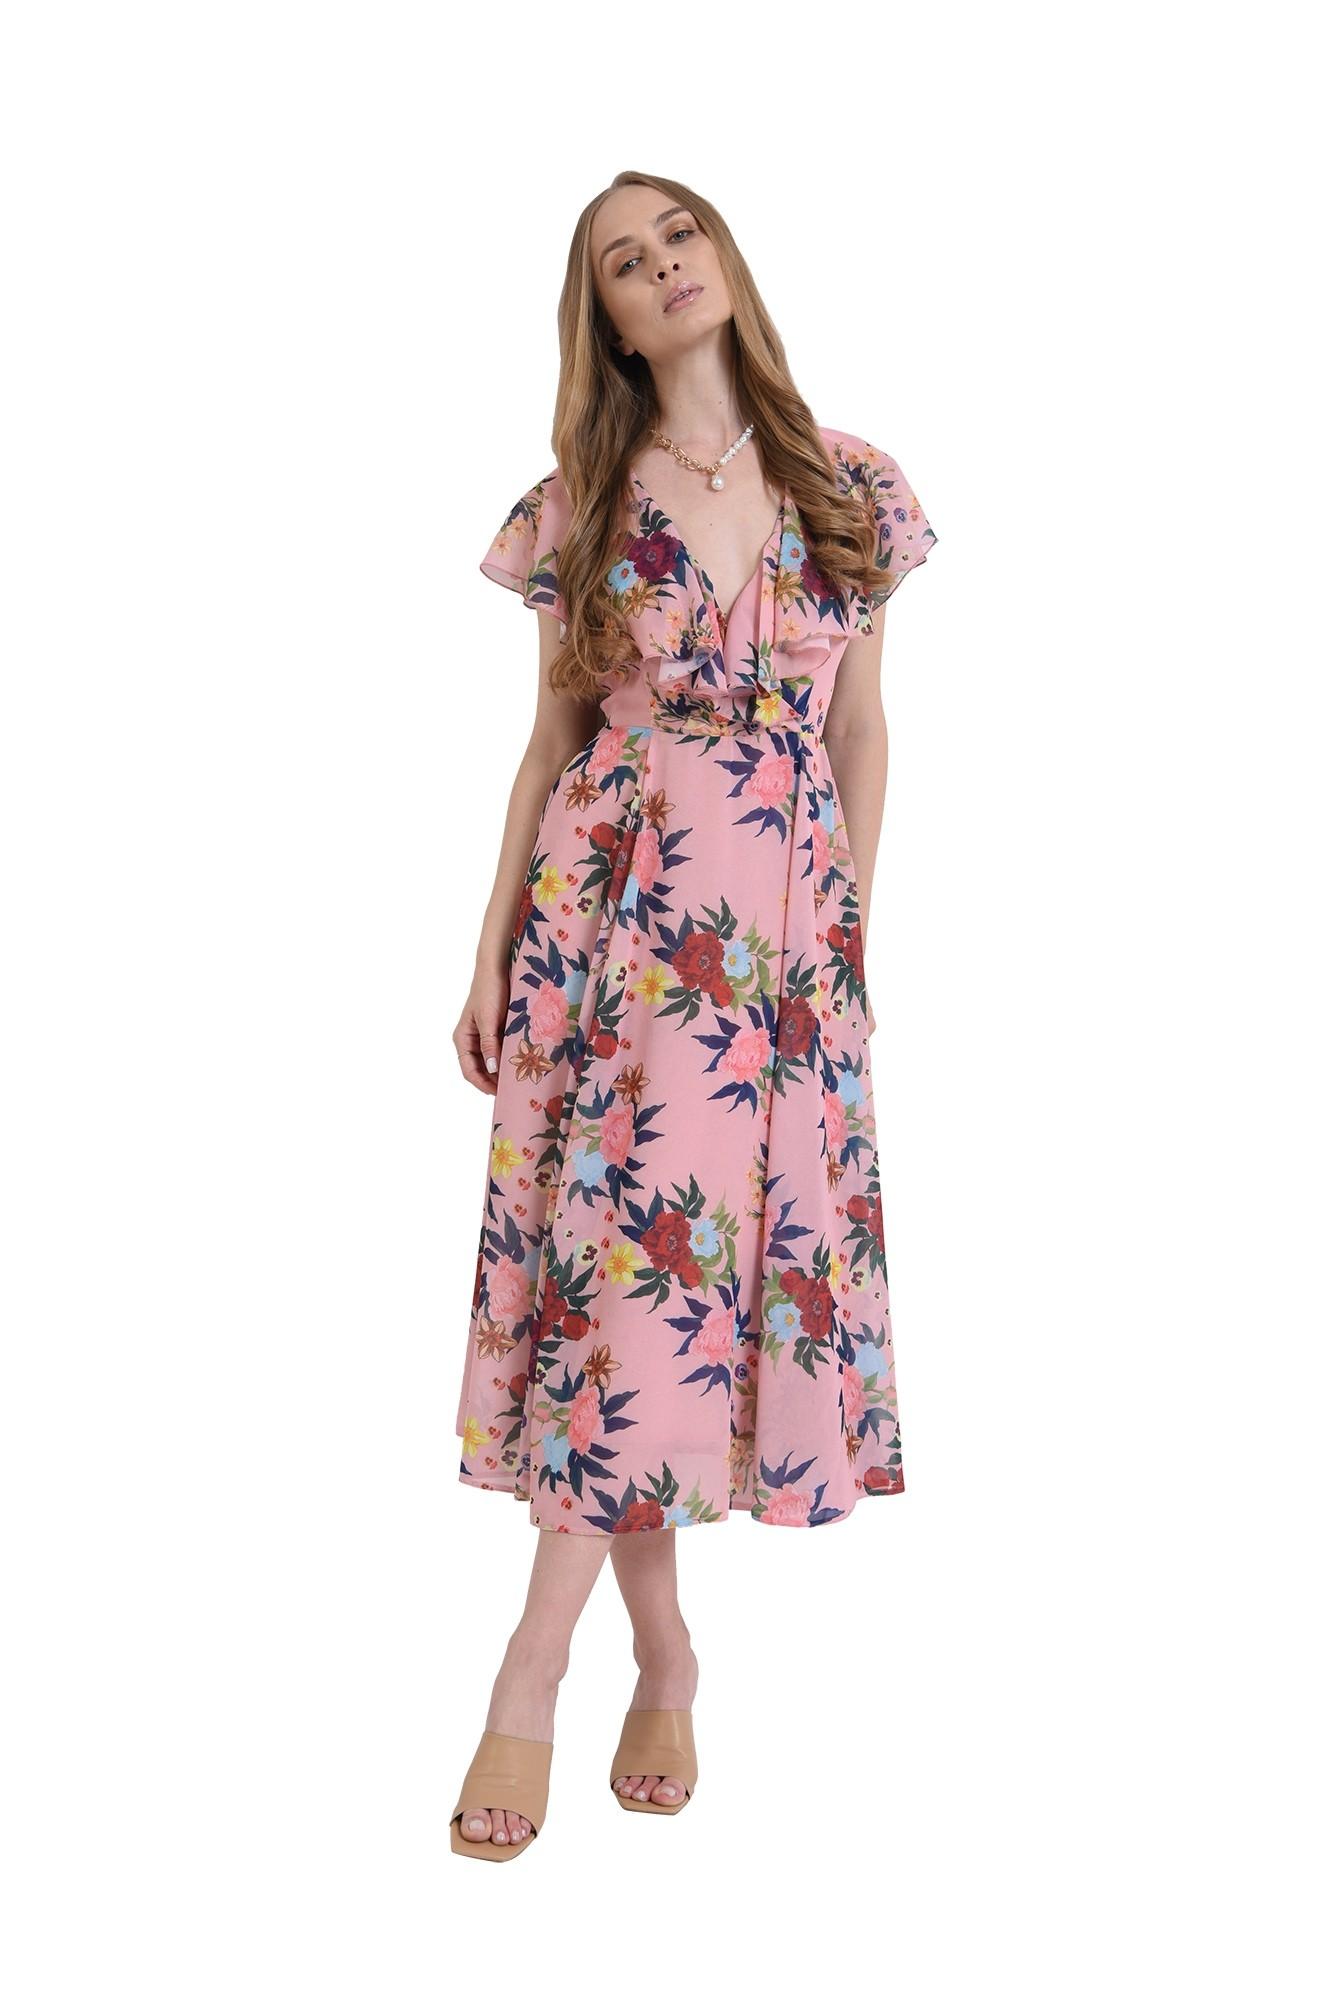 3 - rochie roz, cu volane la anchior, evazata